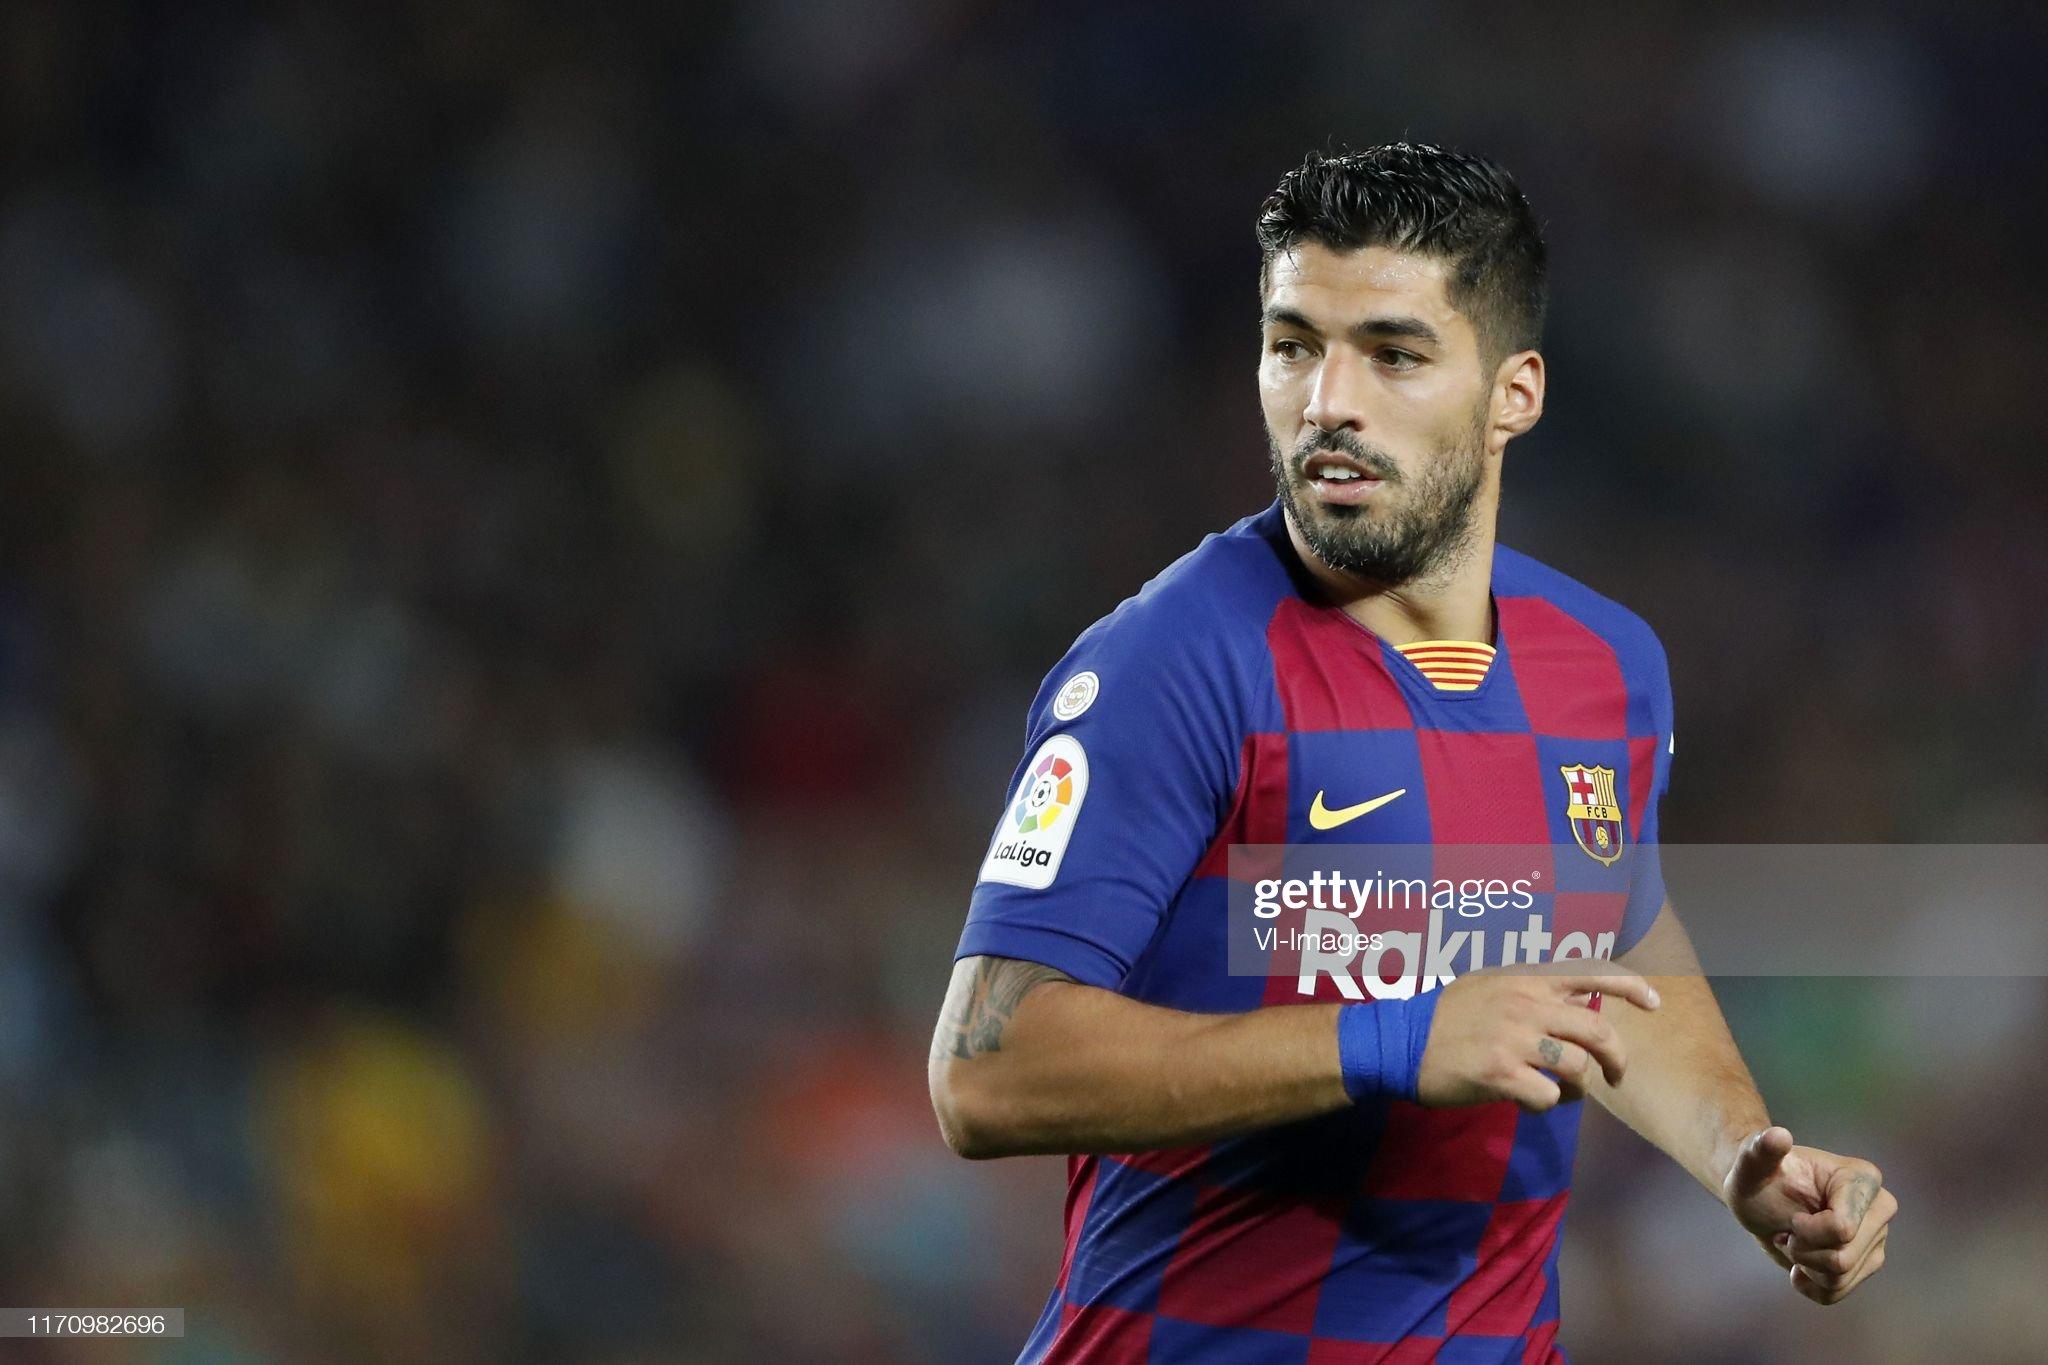 صور مباراة : برشلونة - فياريال 2-1 ( 24-09-2019 )  Luis-suarez-of-fc-barcelona-during-the-laliga-santander-match-between-picture-id1170982696?s=2048x2048